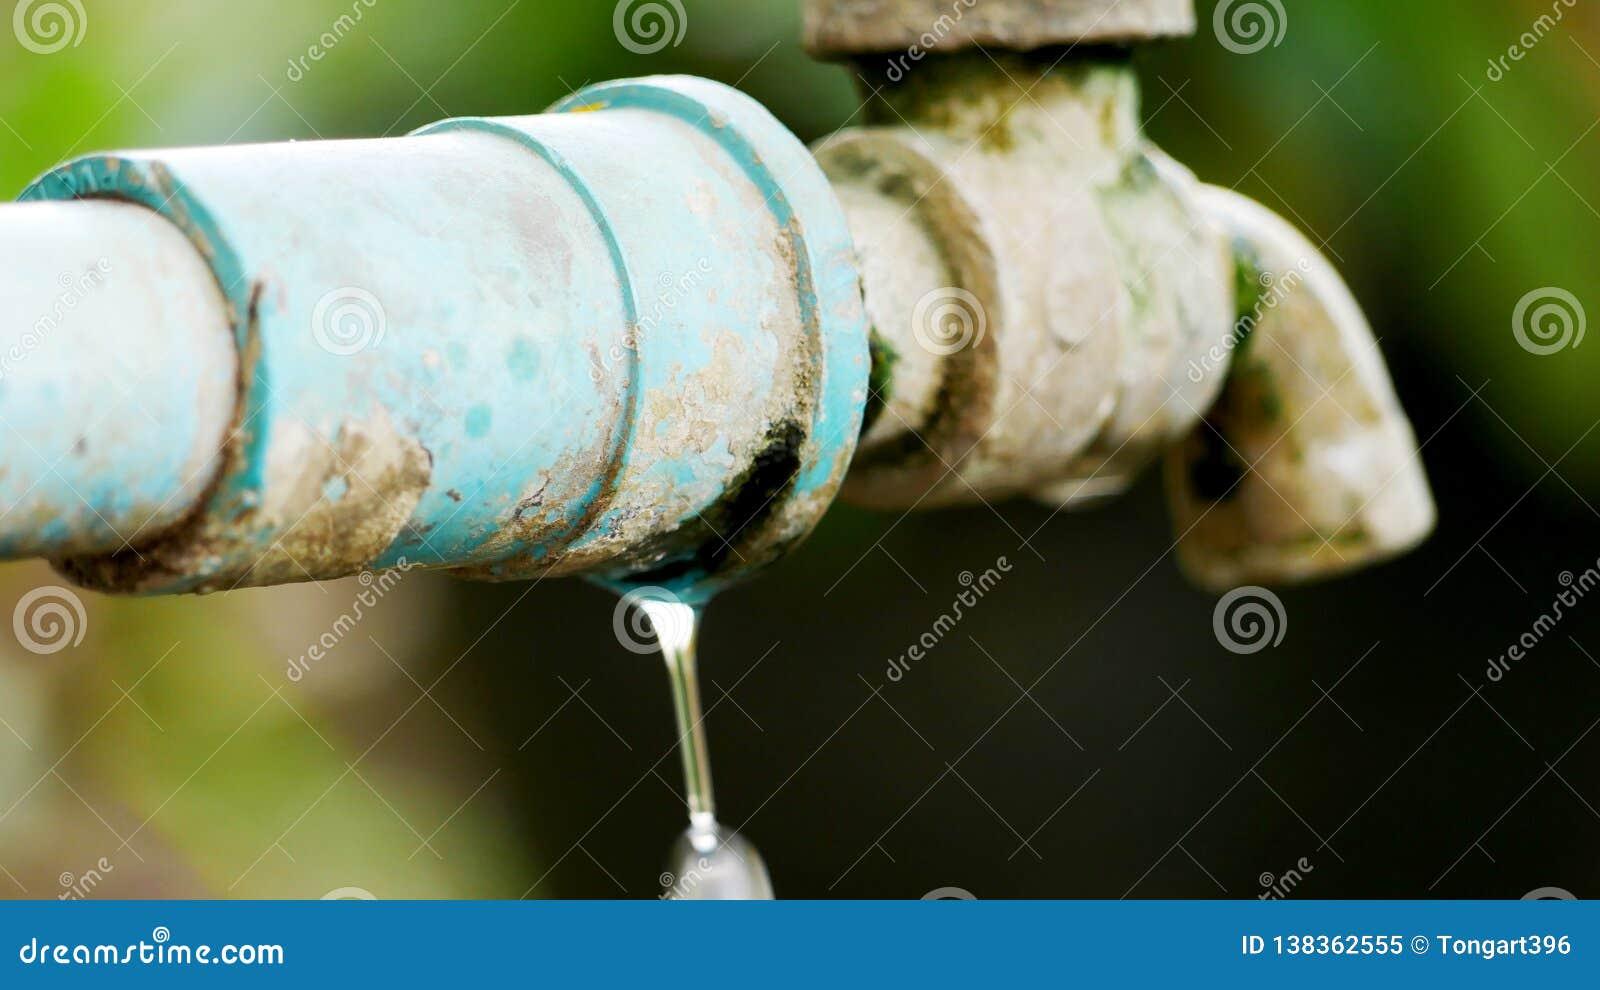 Cracks at the faucet